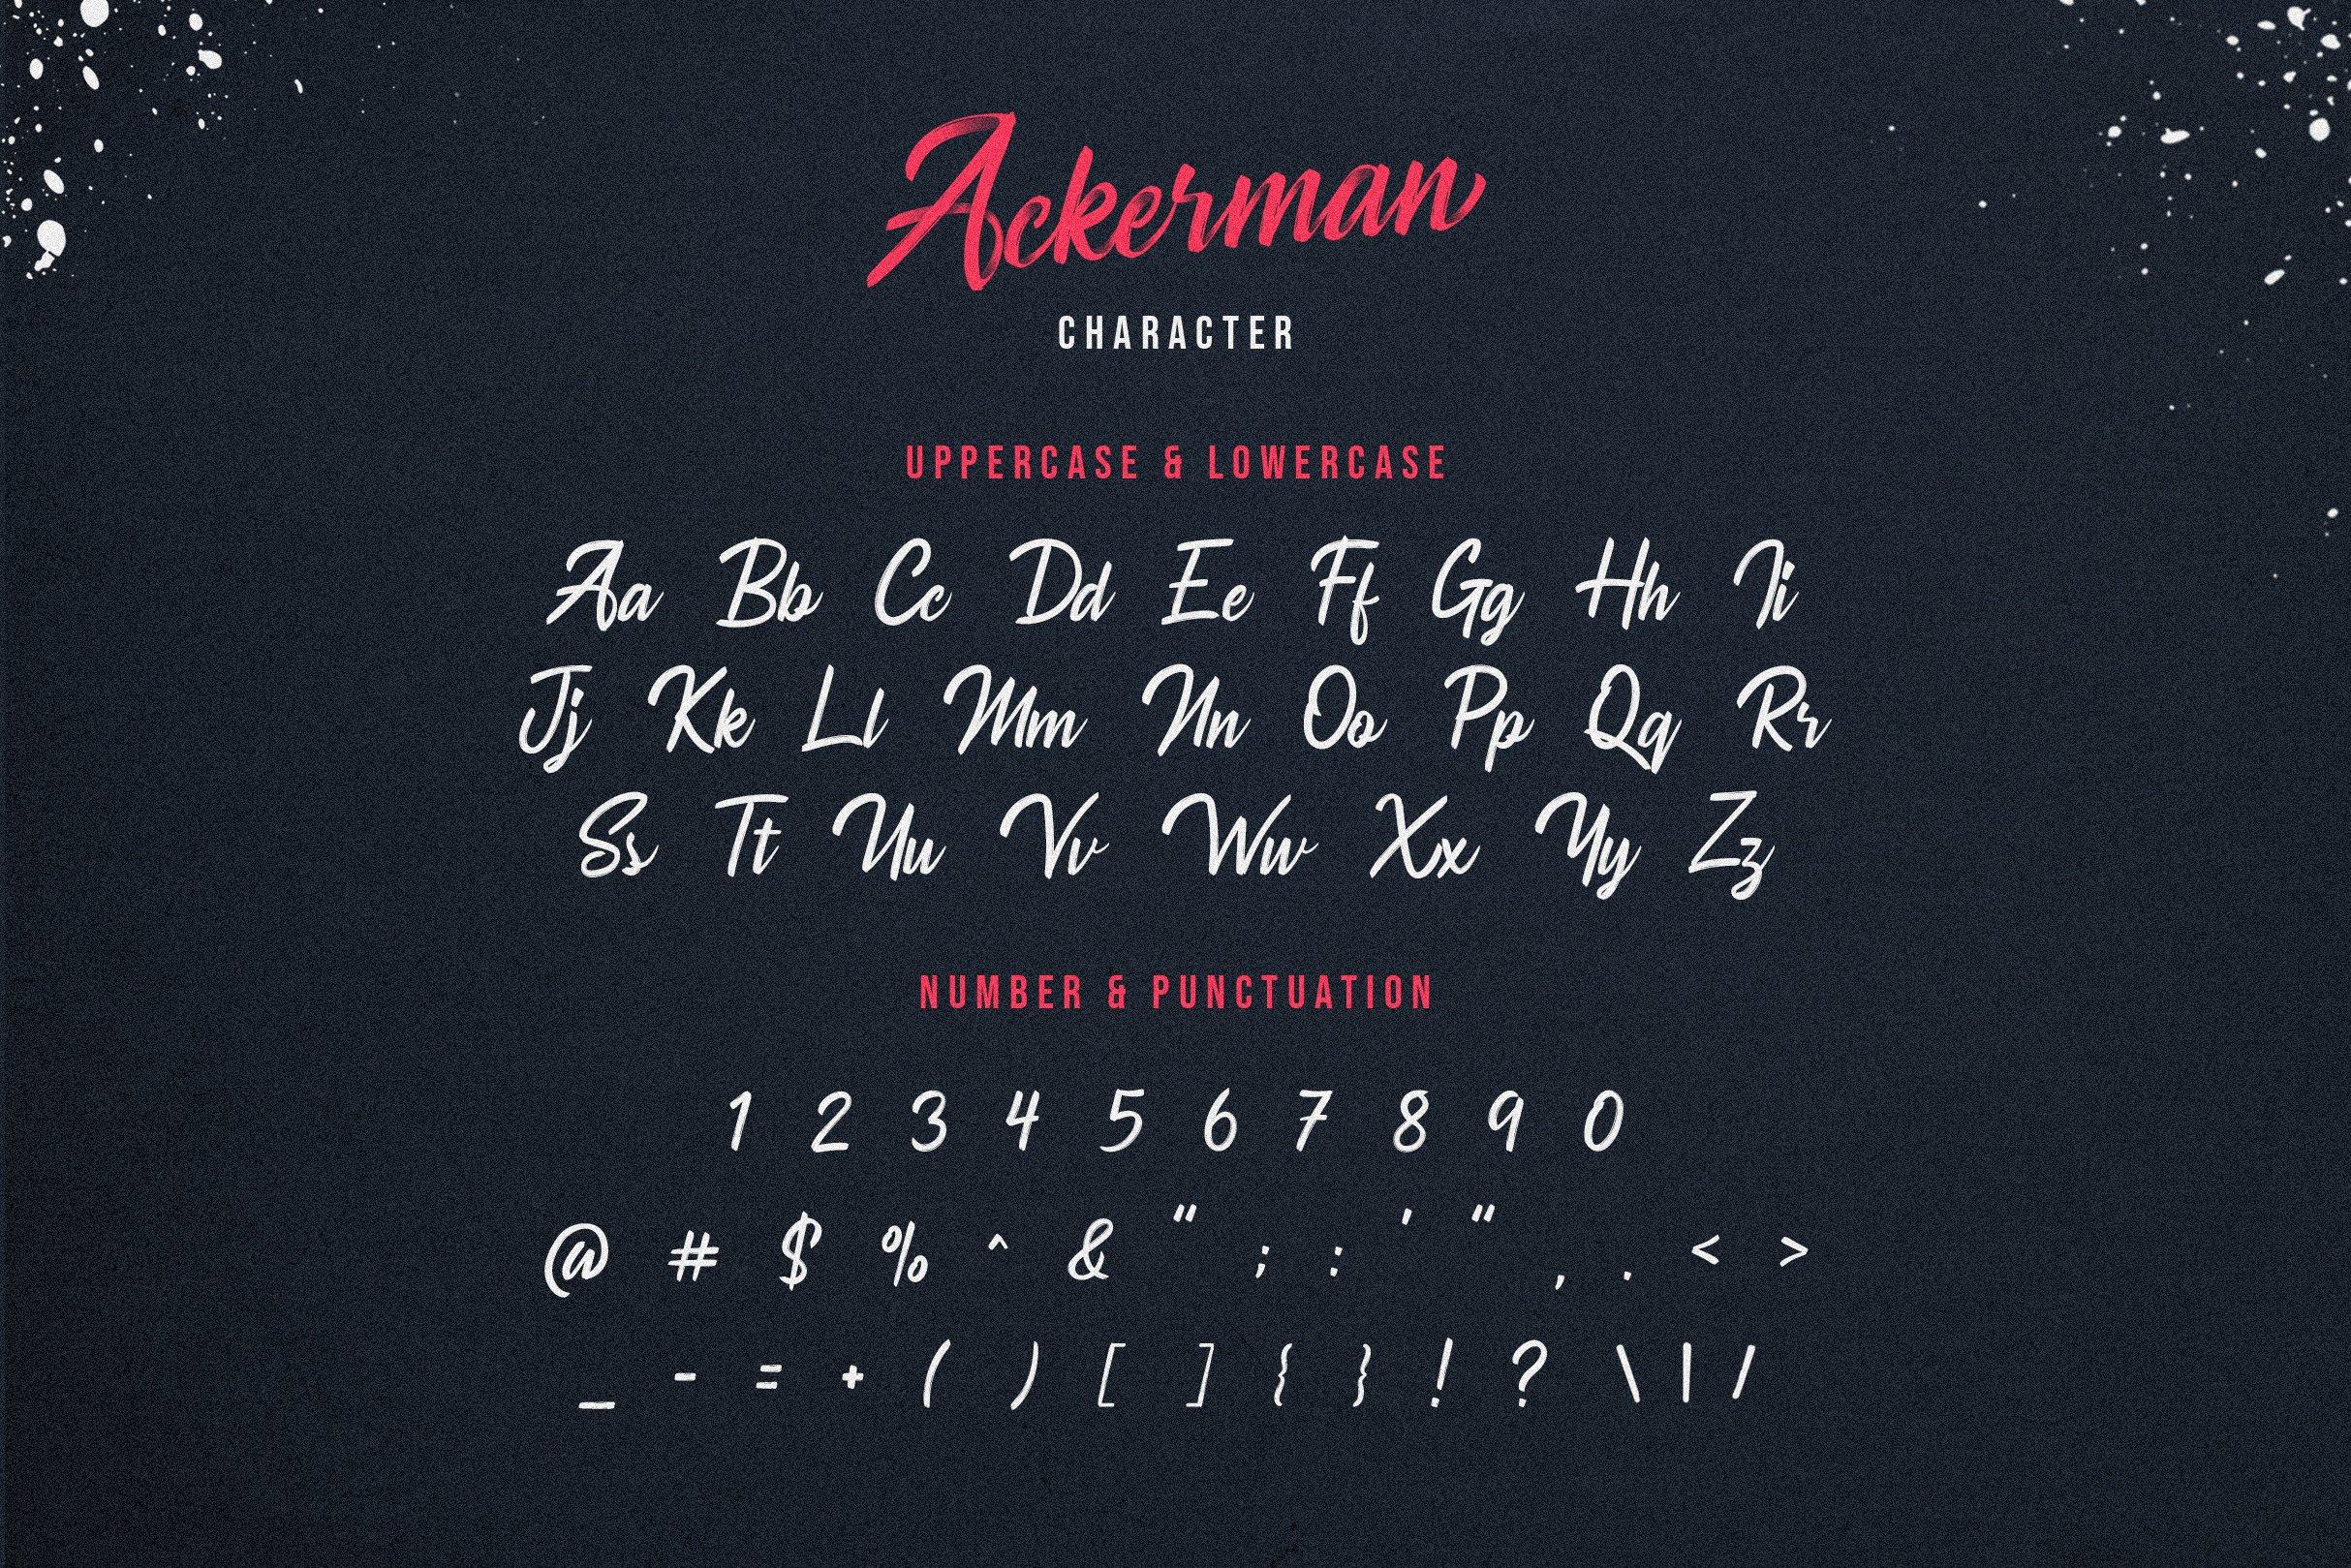 Ackerman Handlettered Script Font example image 4